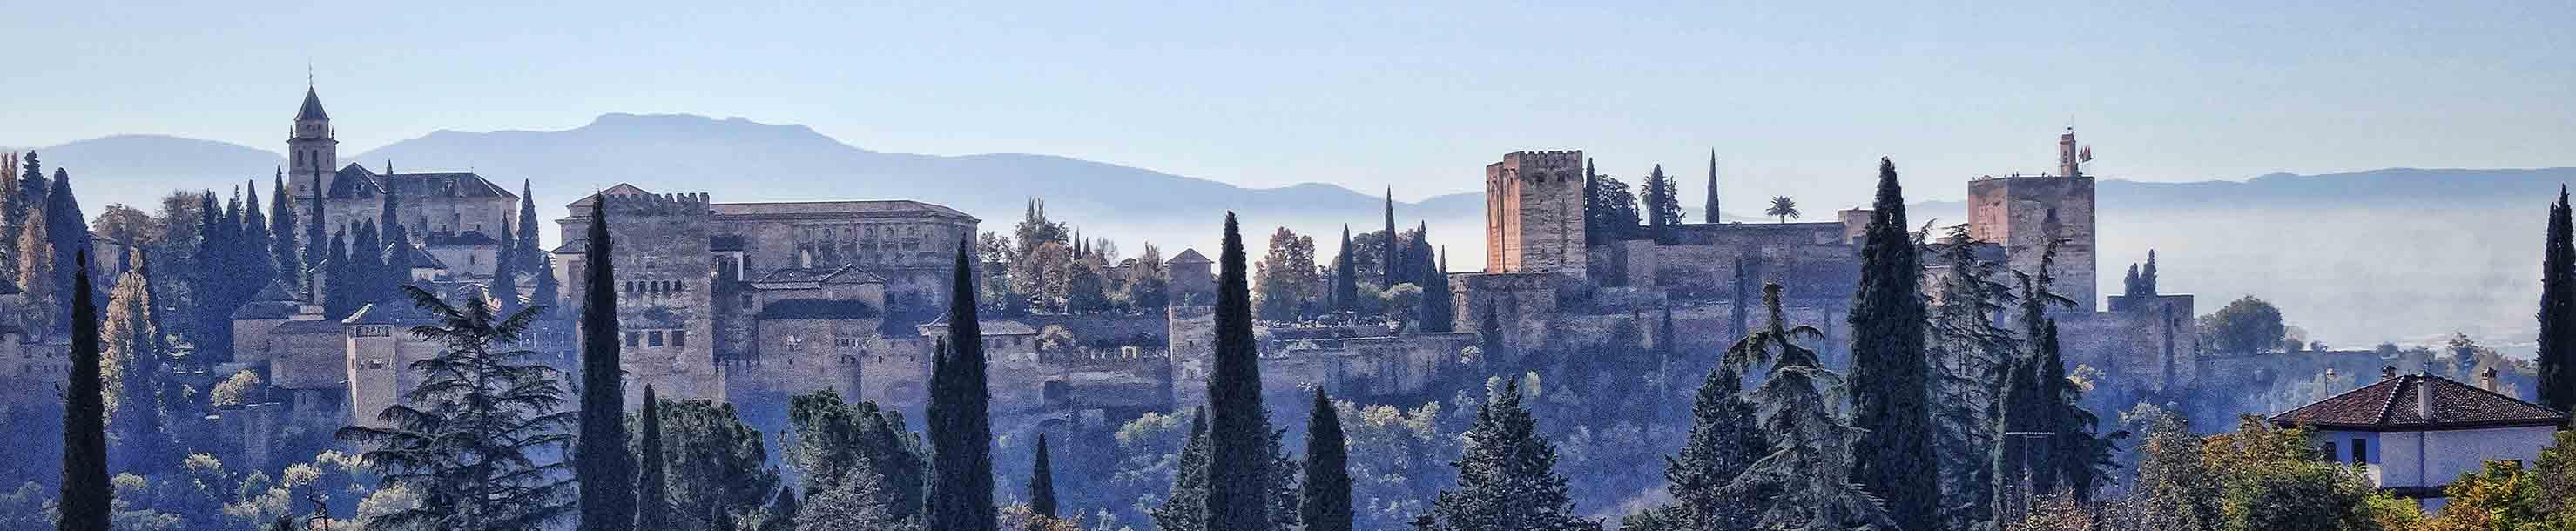 Visita guiada completa a la Alhambra